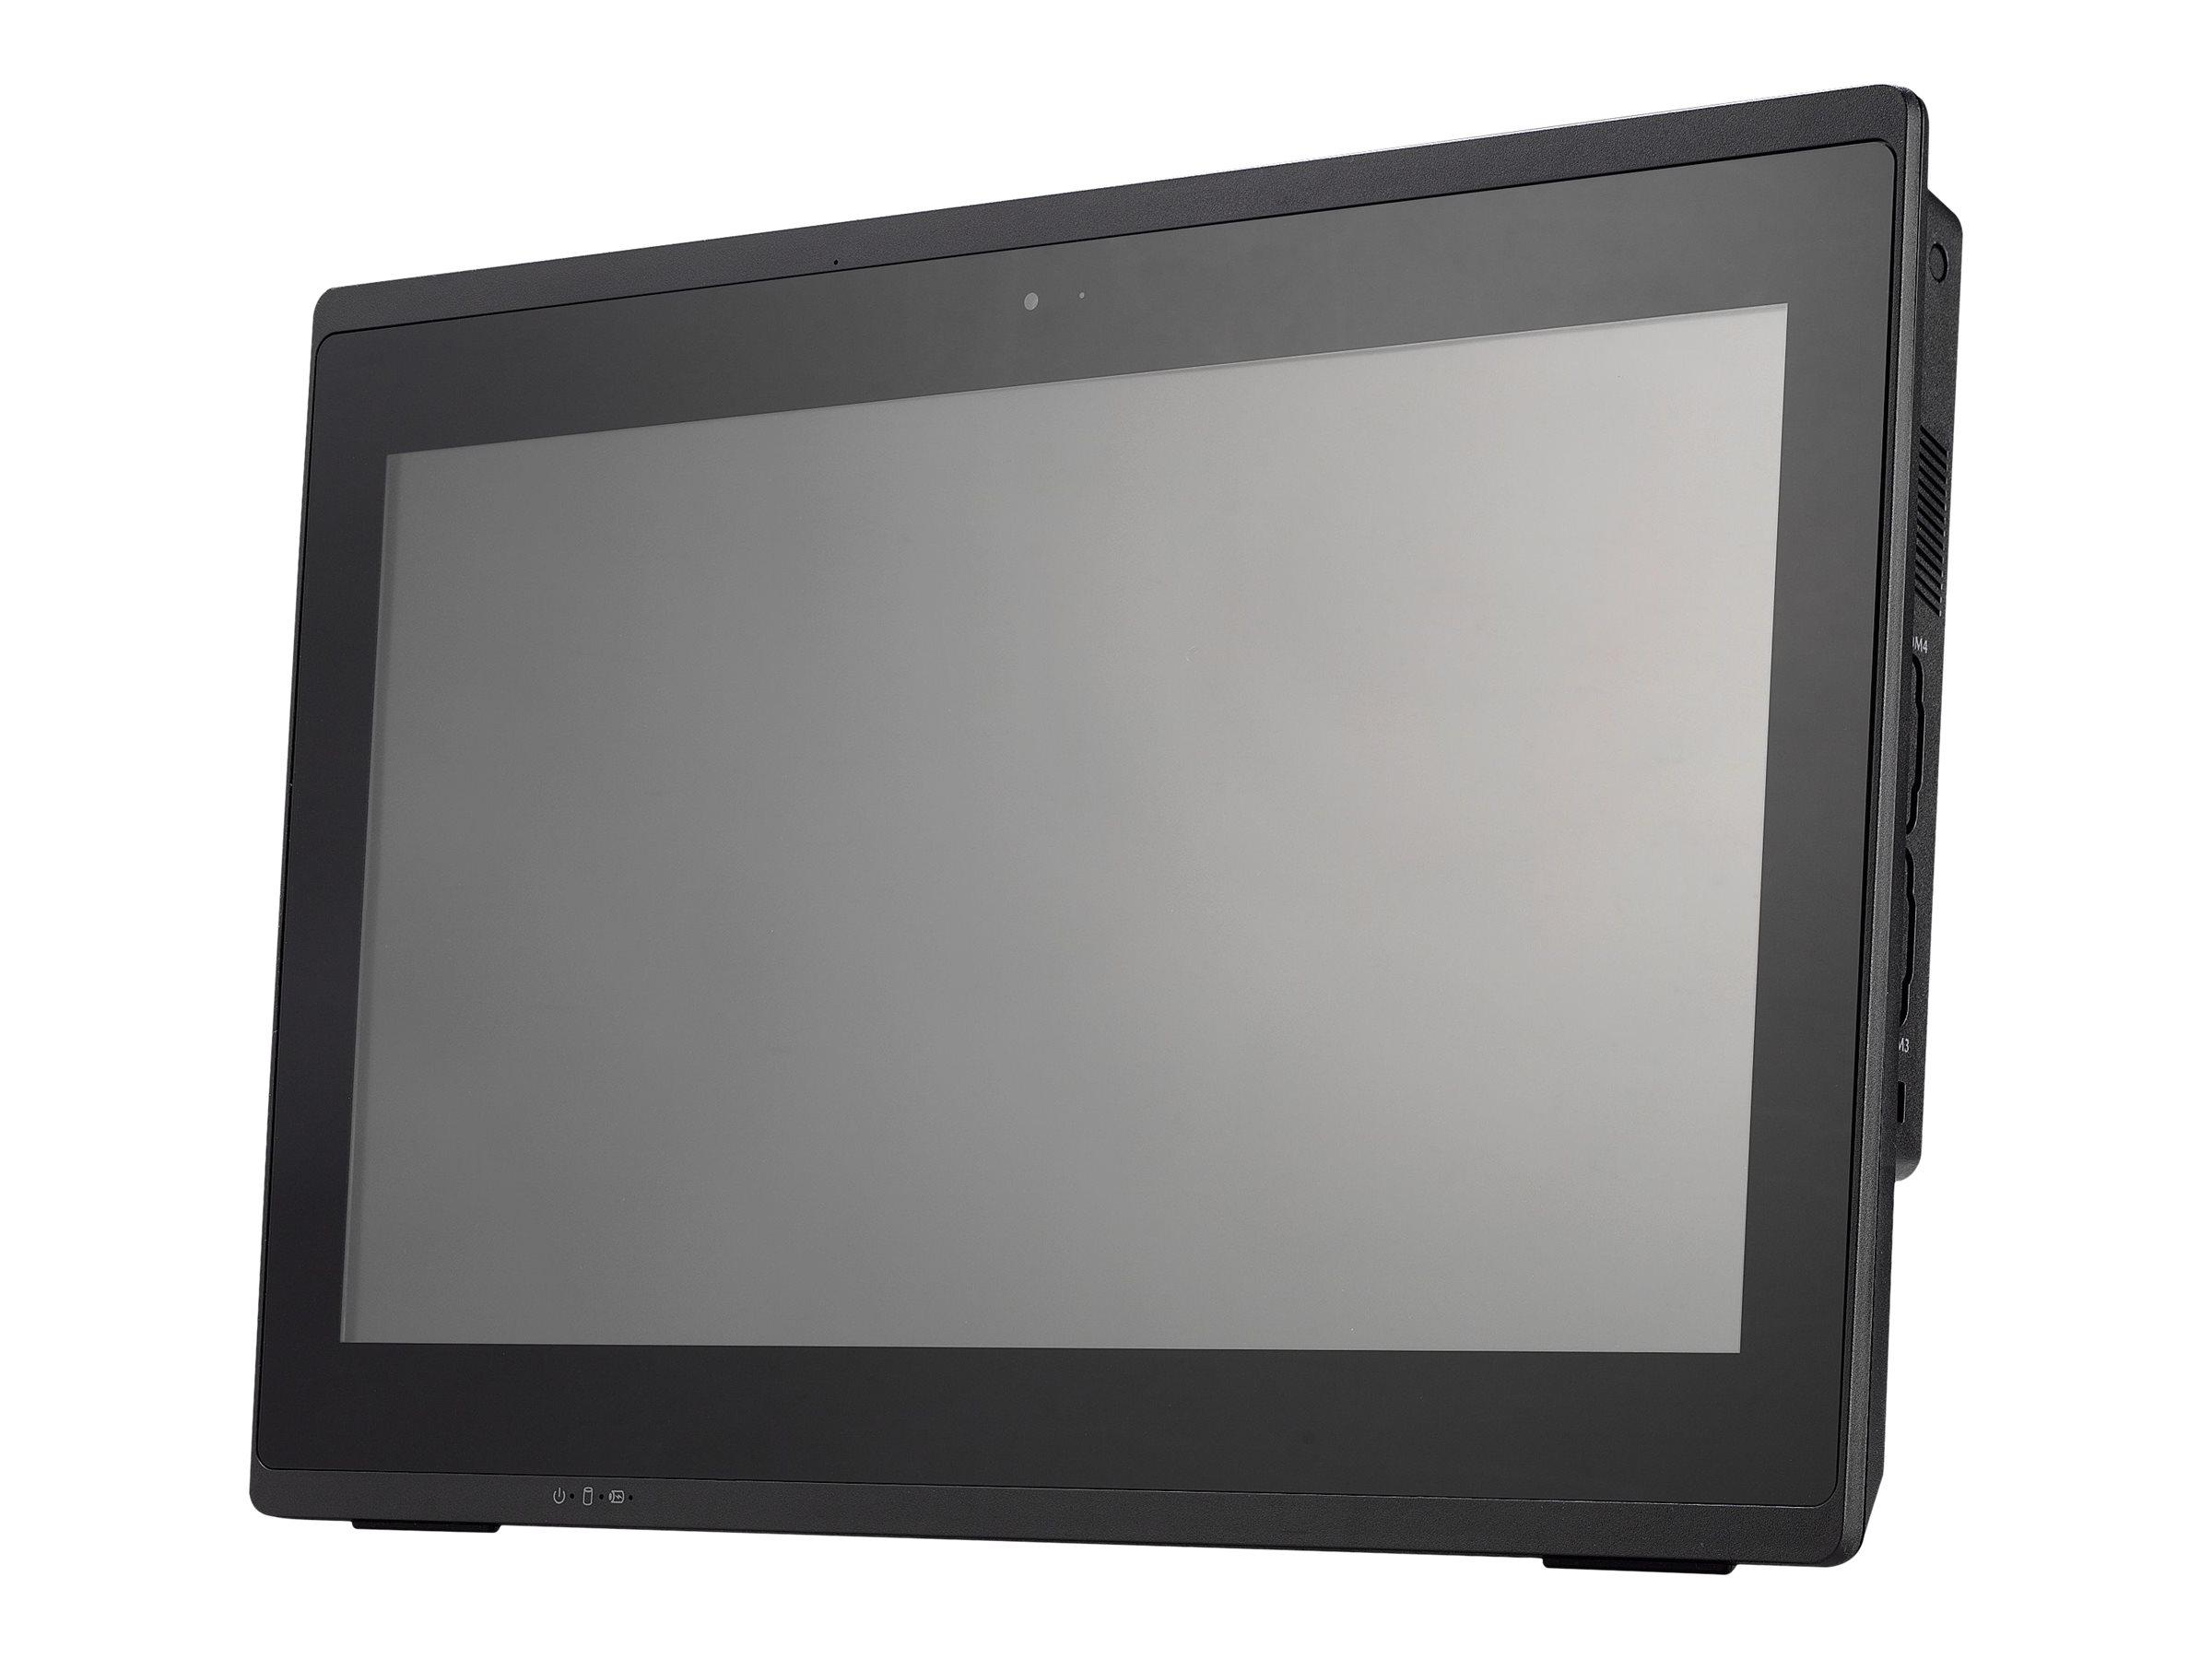 Shuttle XPC POS P511 - All-in-One (Komplettlösung) - 1 x Celeron 4205U / 1.8 GHz ULV - RAM 4 GB - SSD 120 GB - HD Graphics 610